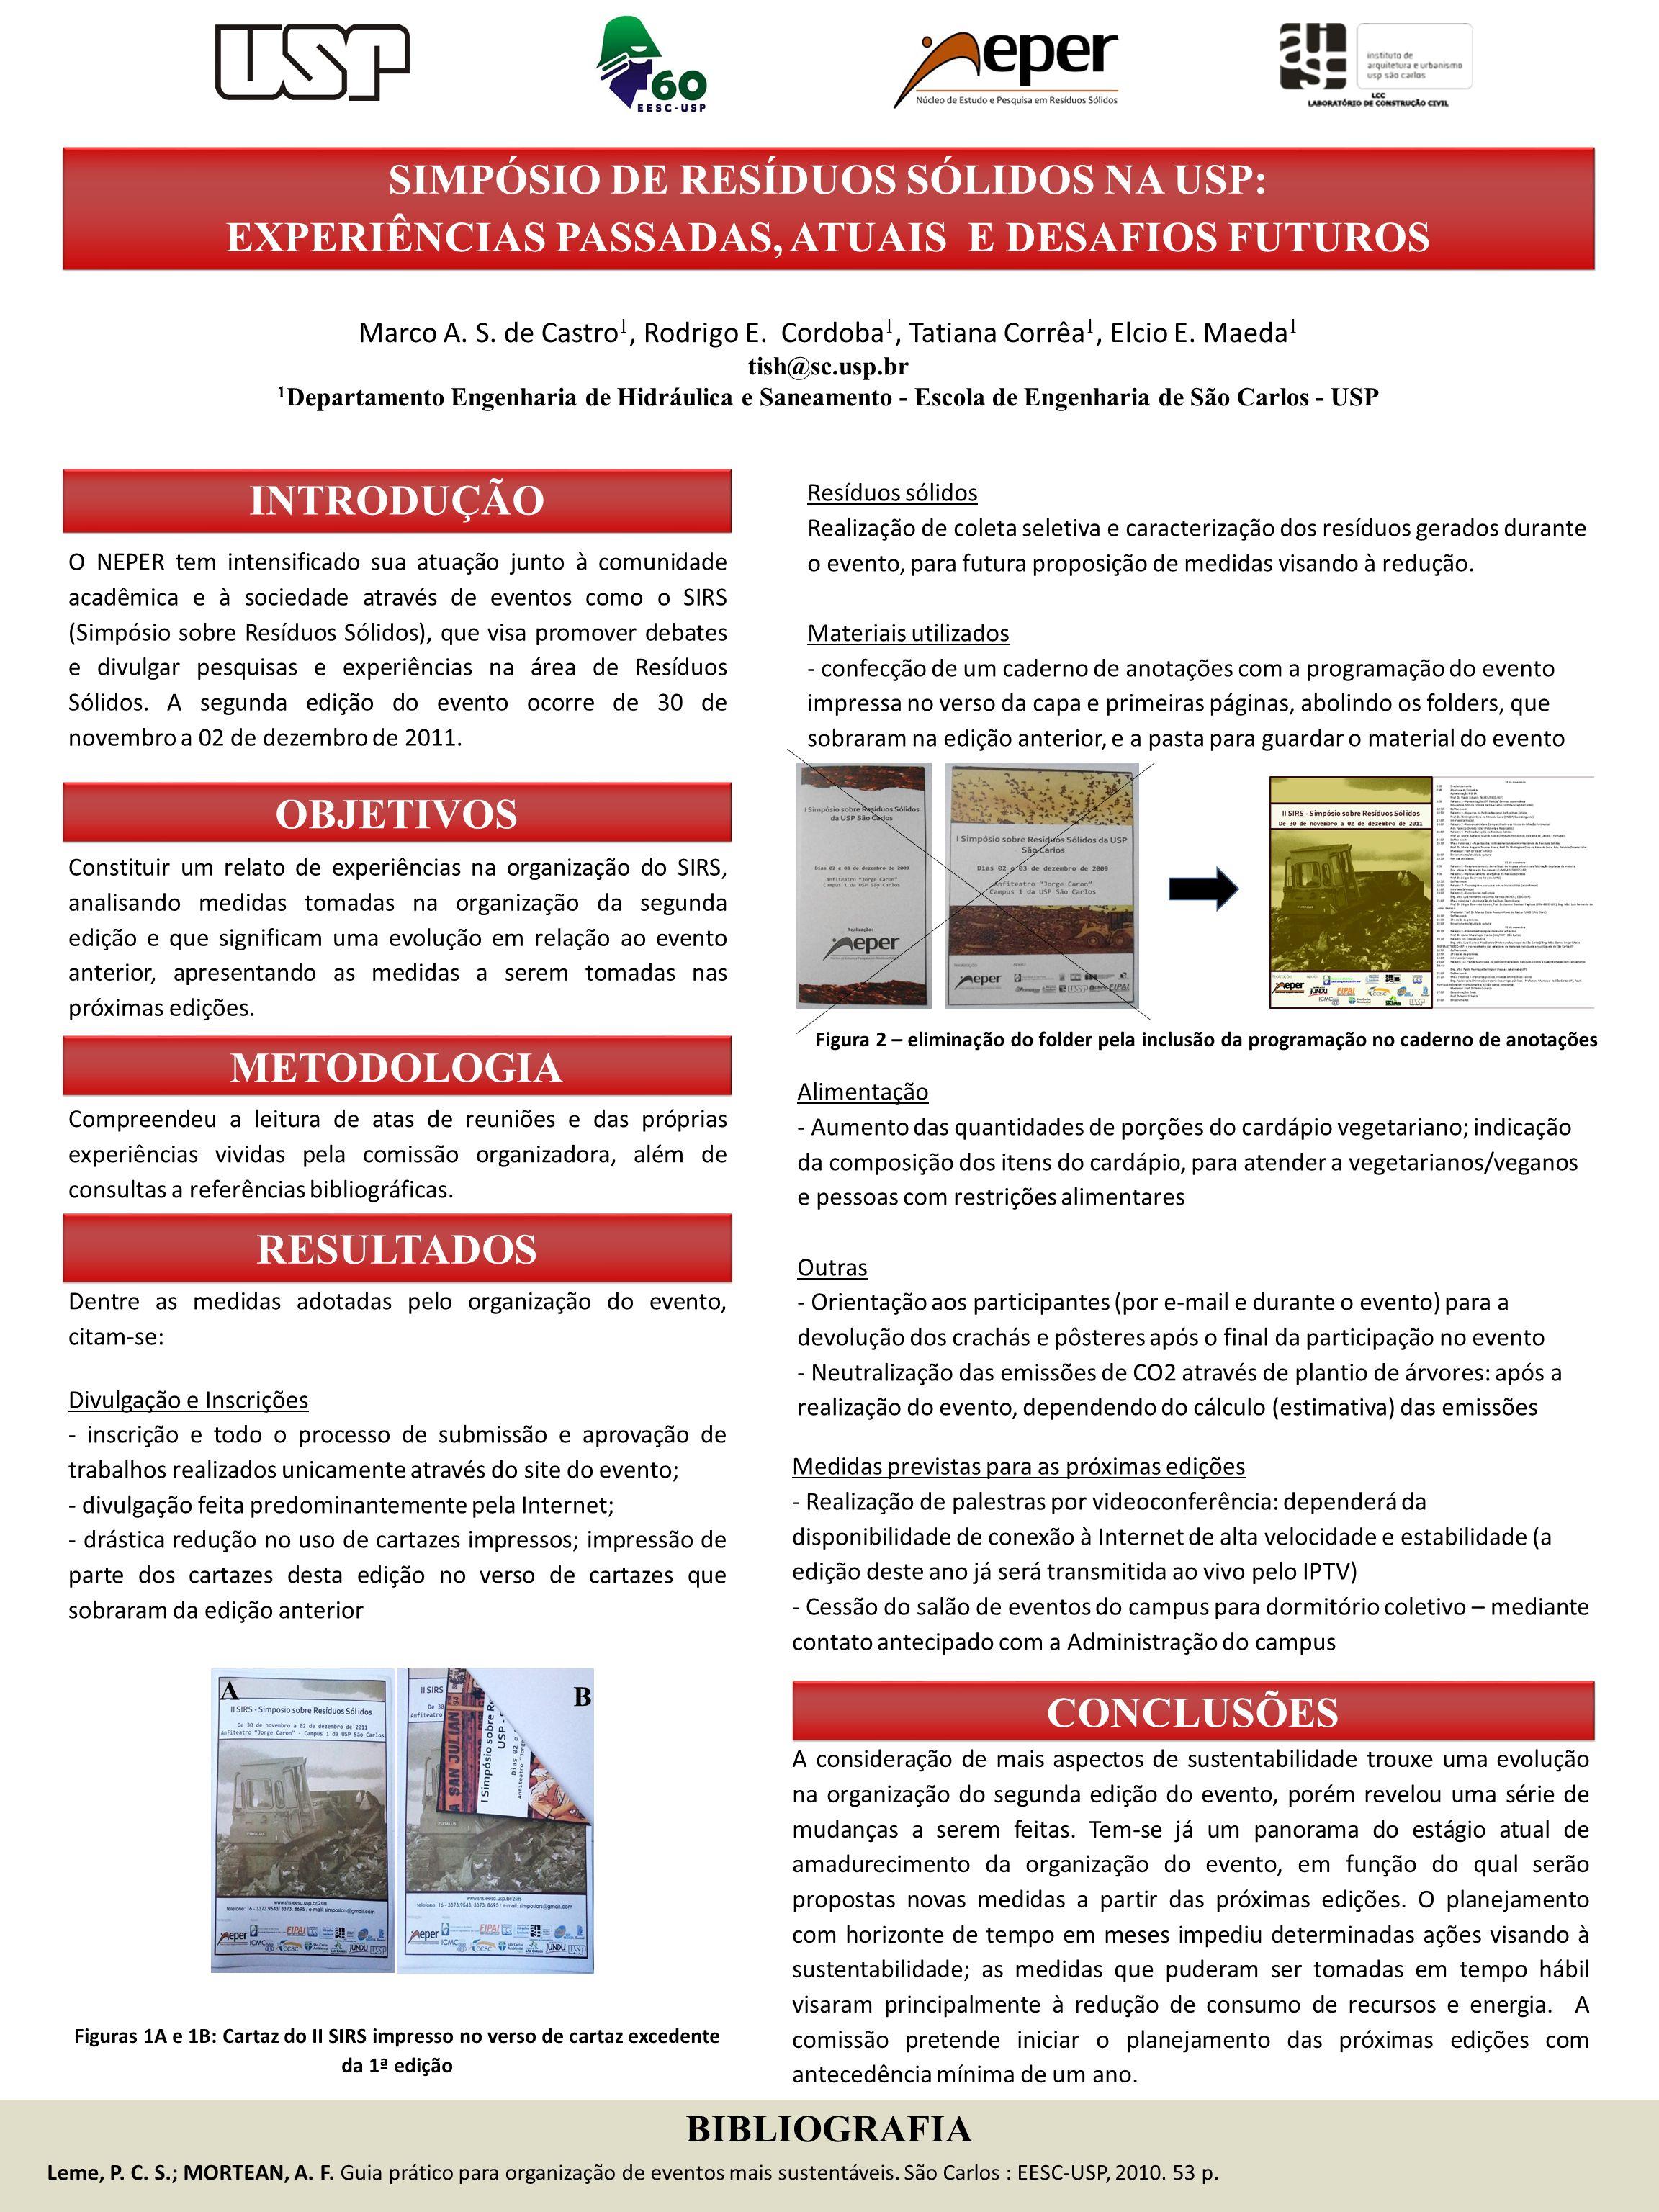 Simpósio de Resíduos Sólidos na USP: experiências passadas, atuais e desafios futuros